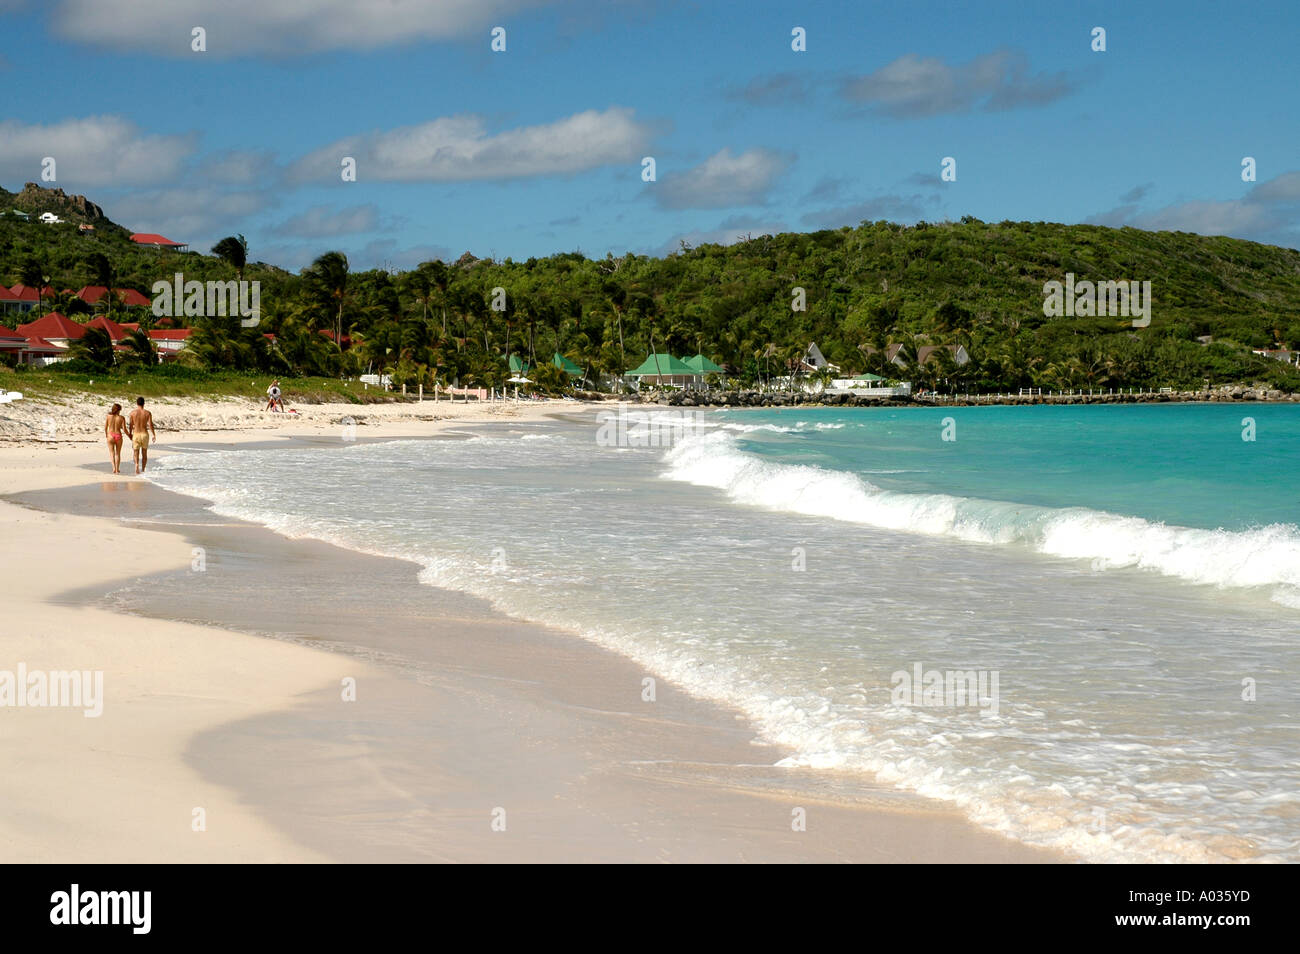 Couple walking beach at  Saint Barth  st jeans beach St Barts st bart saint barthelemy st barts - Stock Image